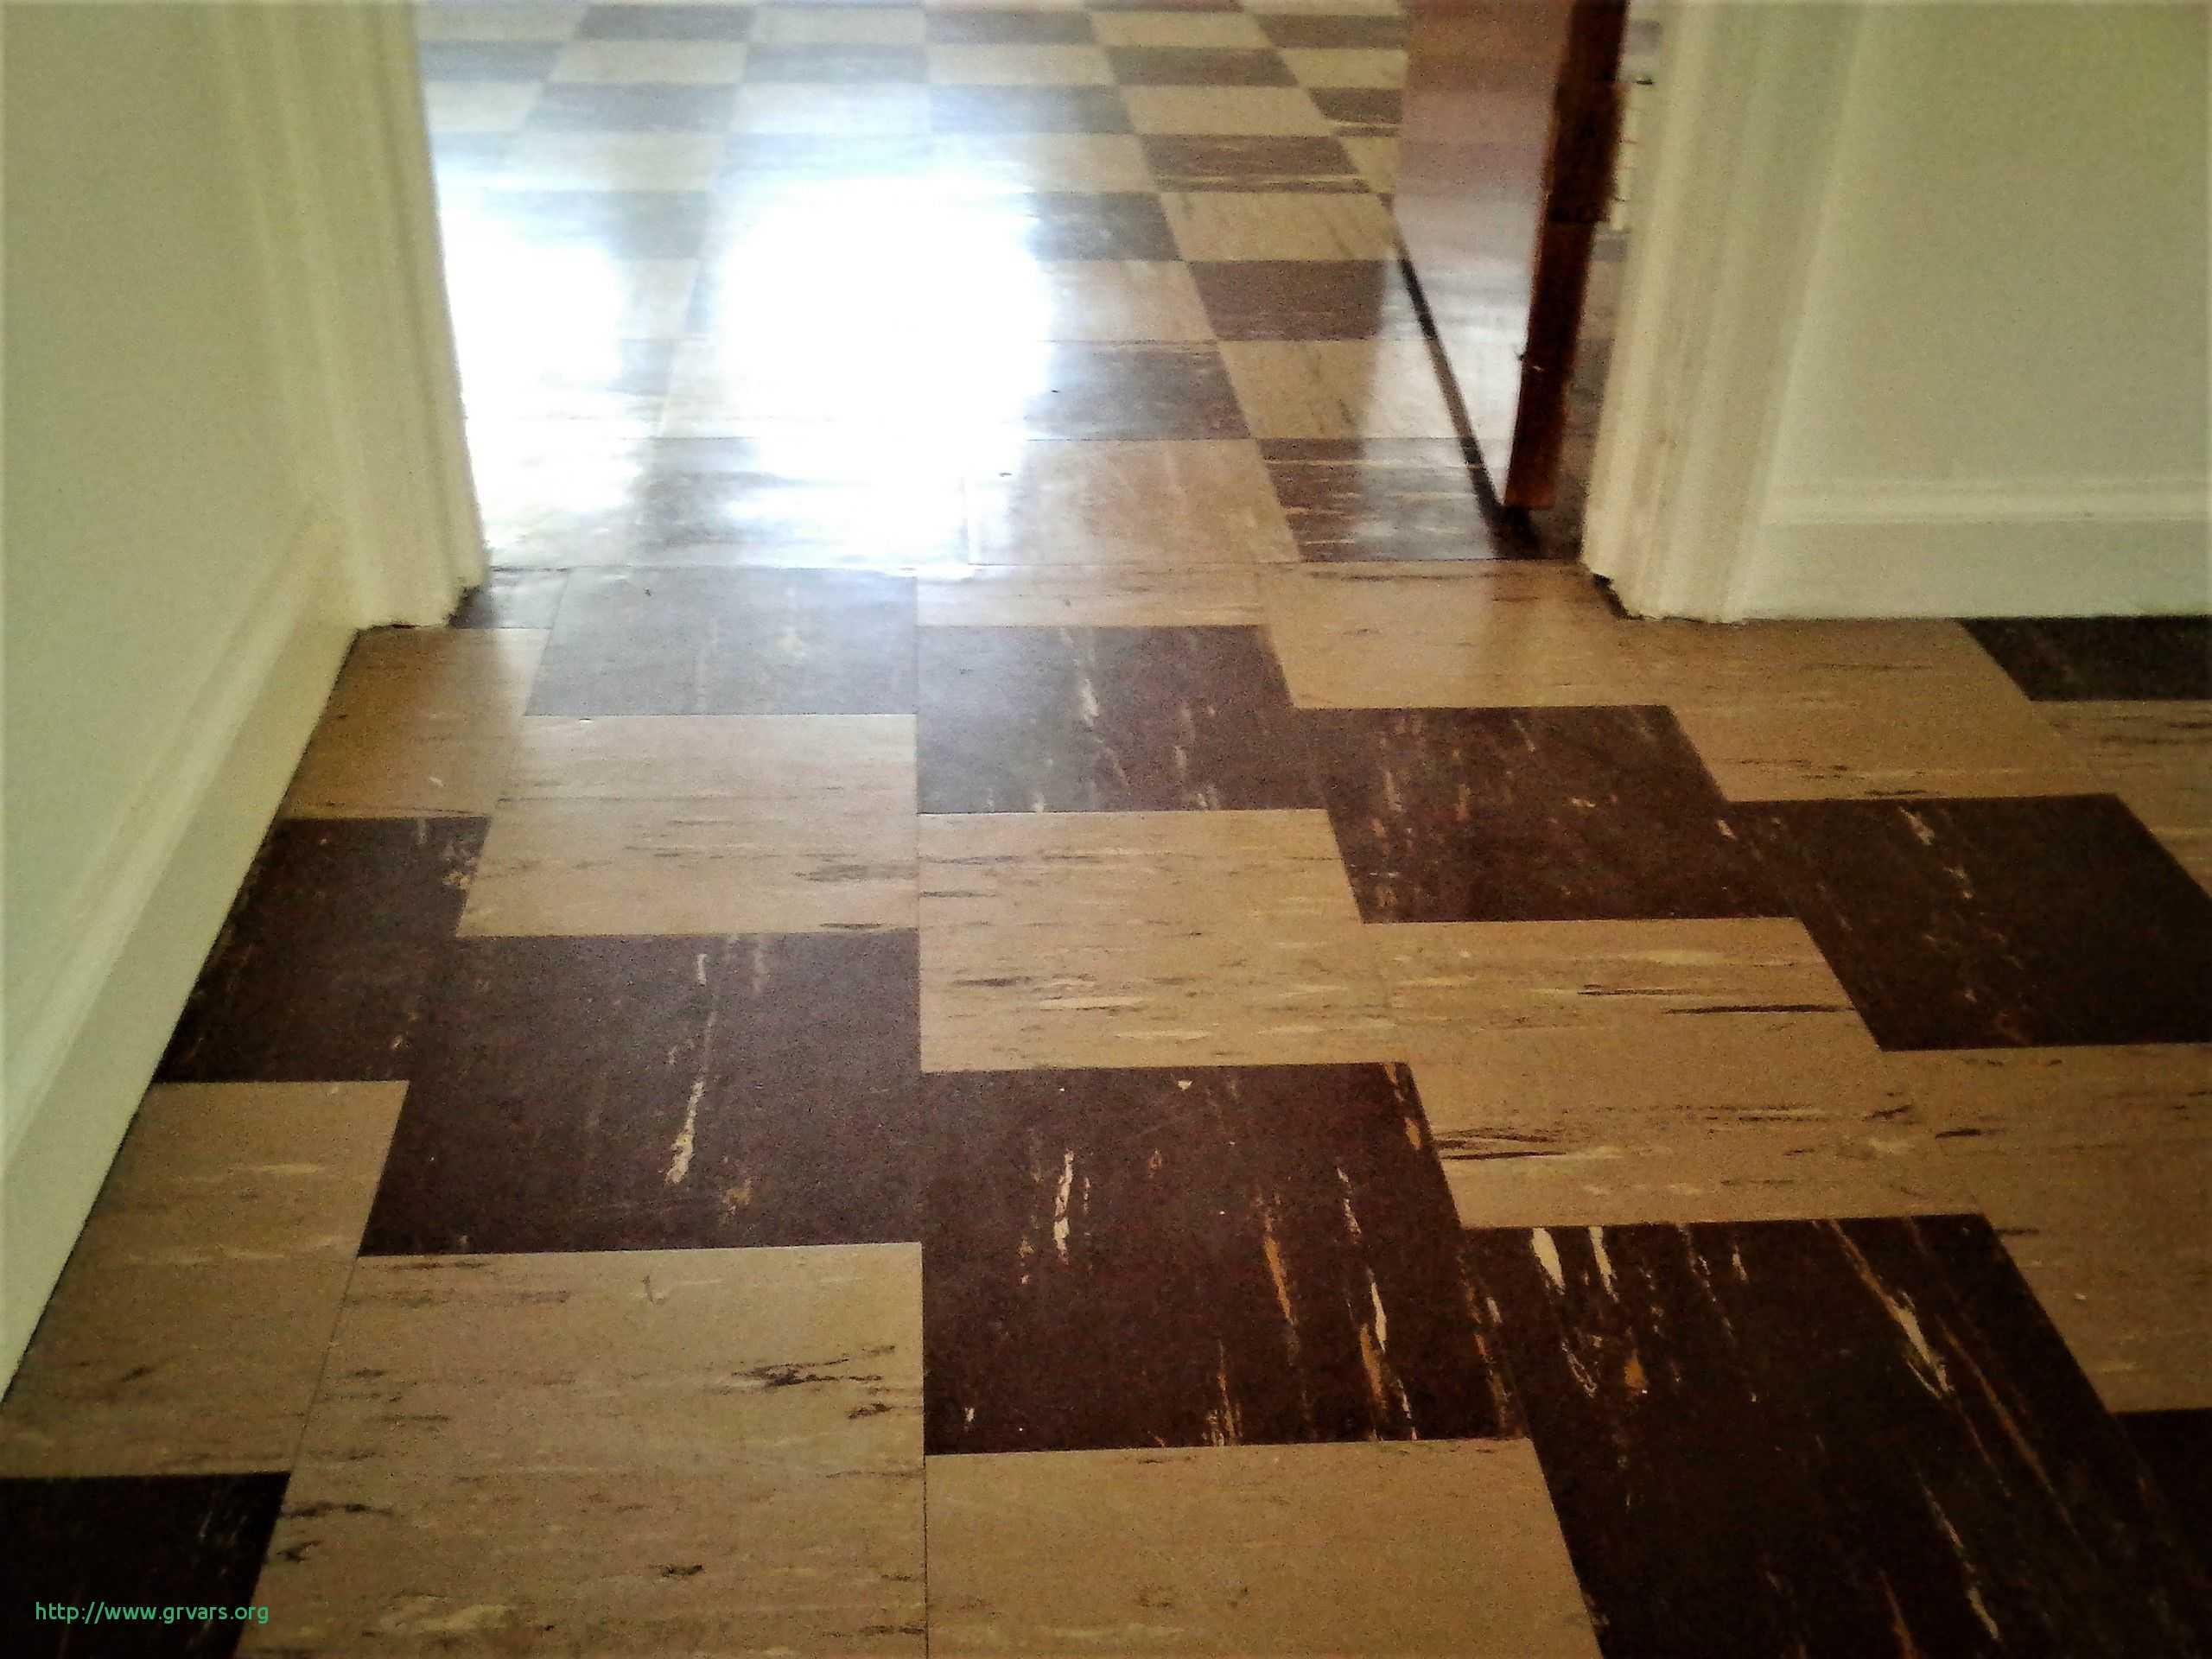 hardwood flooring edmonton ab of 19 a‰lagant flooring jobs edmonton ideas blog pertaining to old vinyl asbestos tile flooring